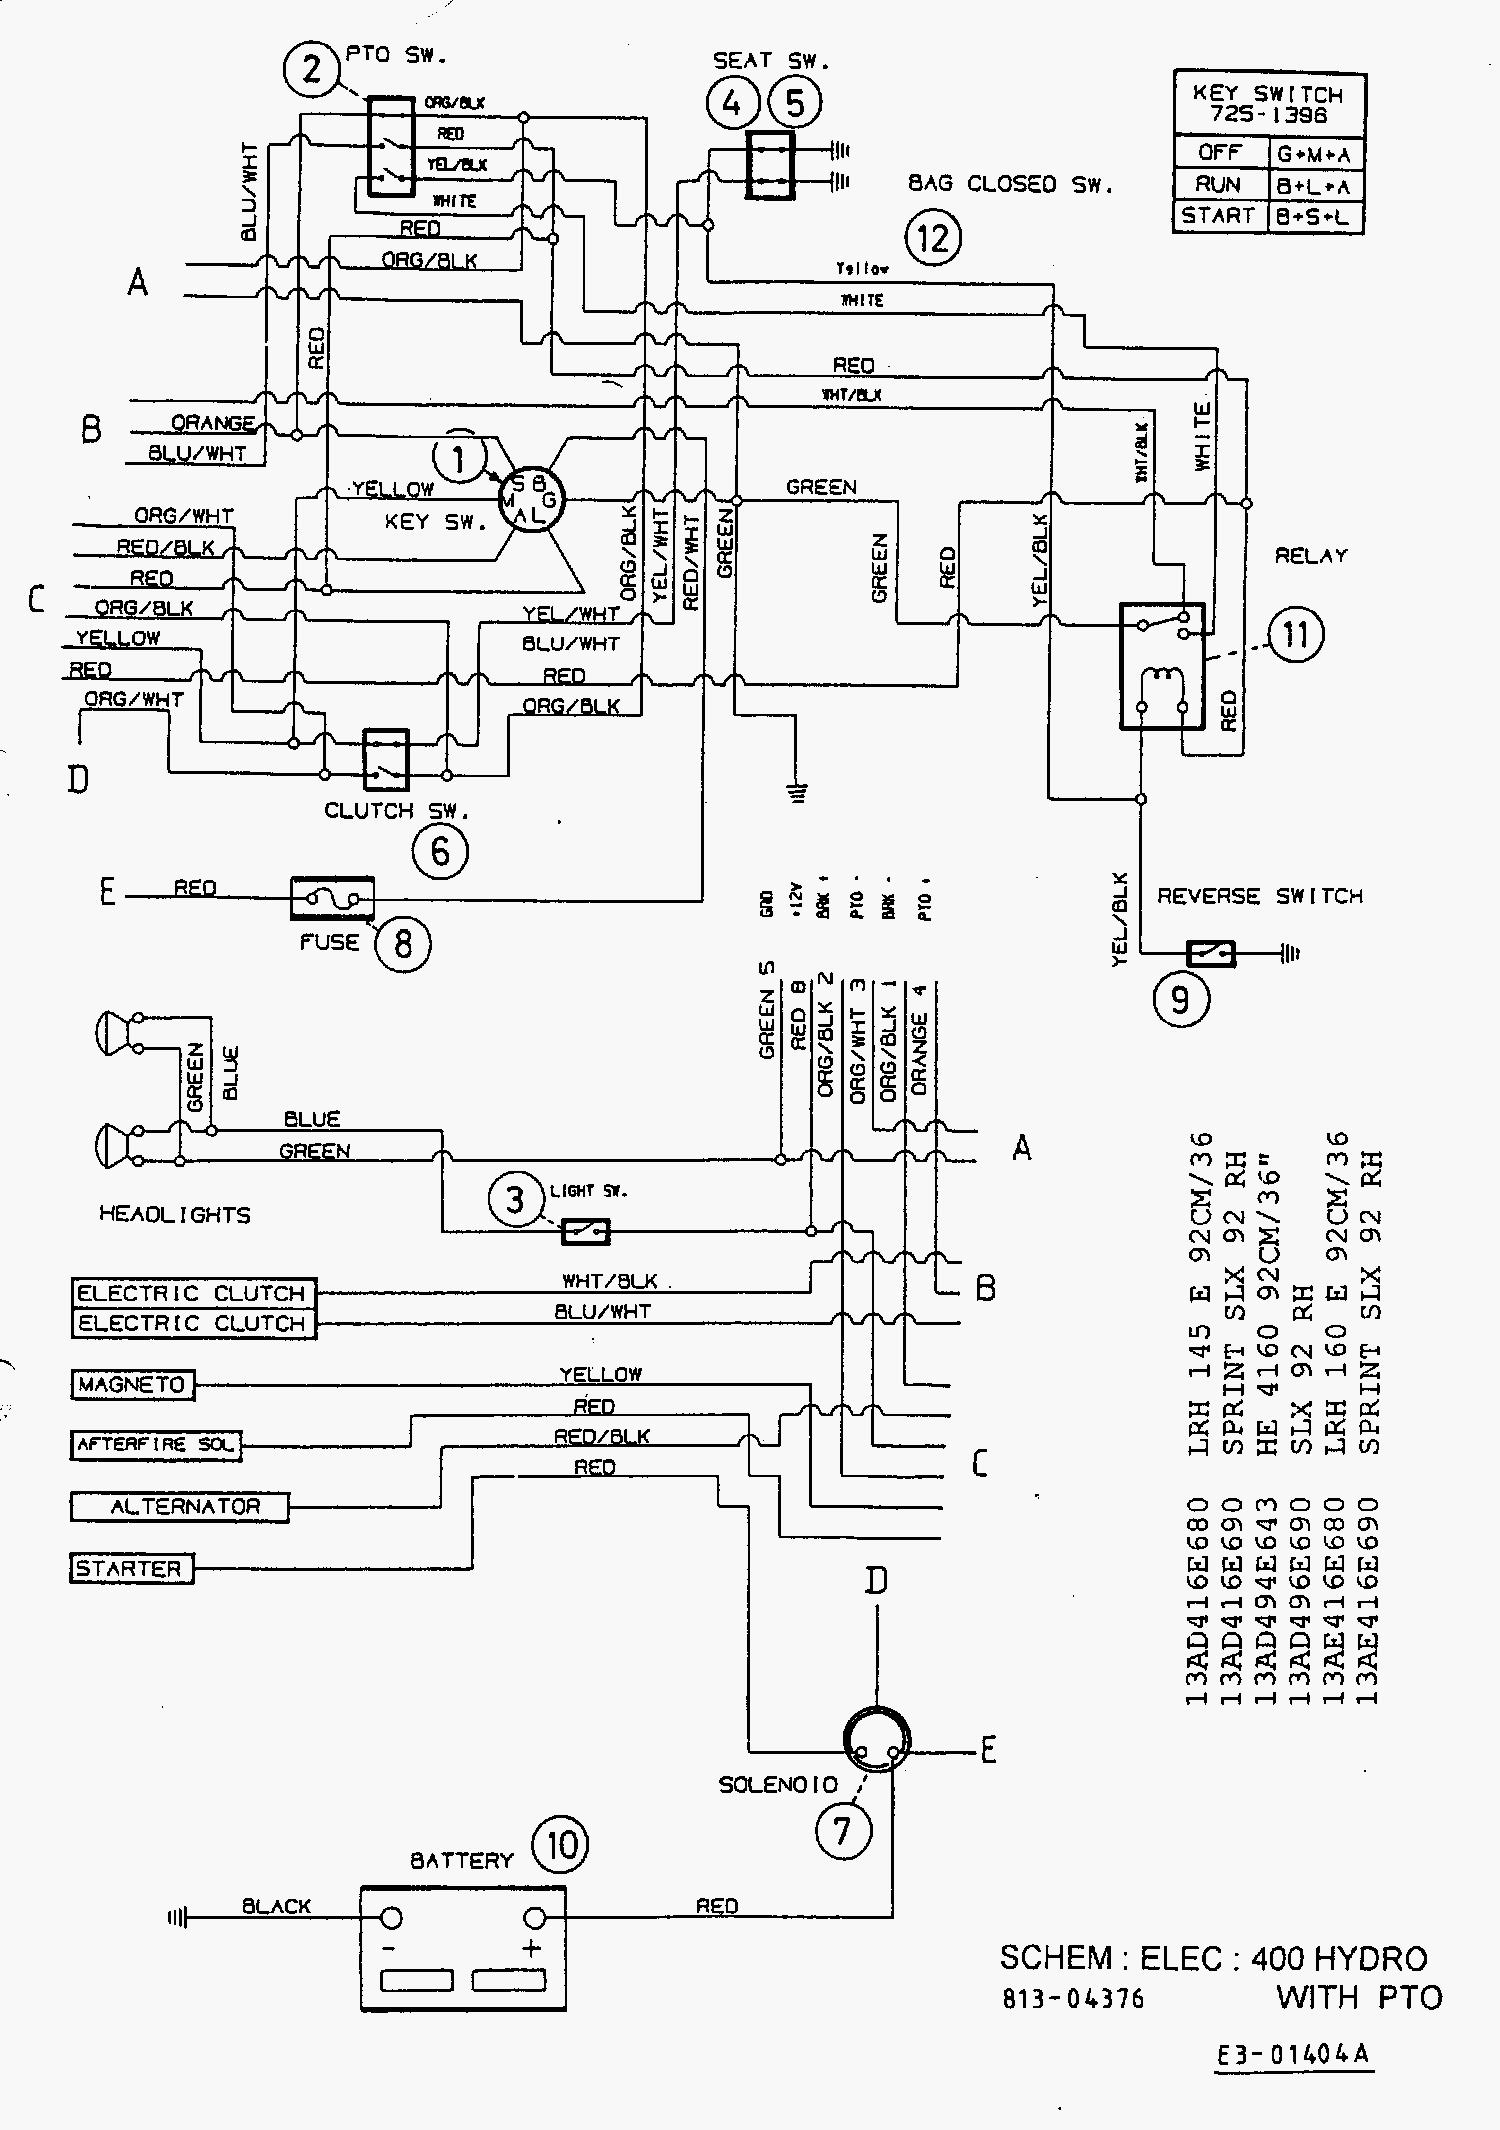 Mtd Lawn Tractor Wiring Diagram Car Tuning, Mtd, Free